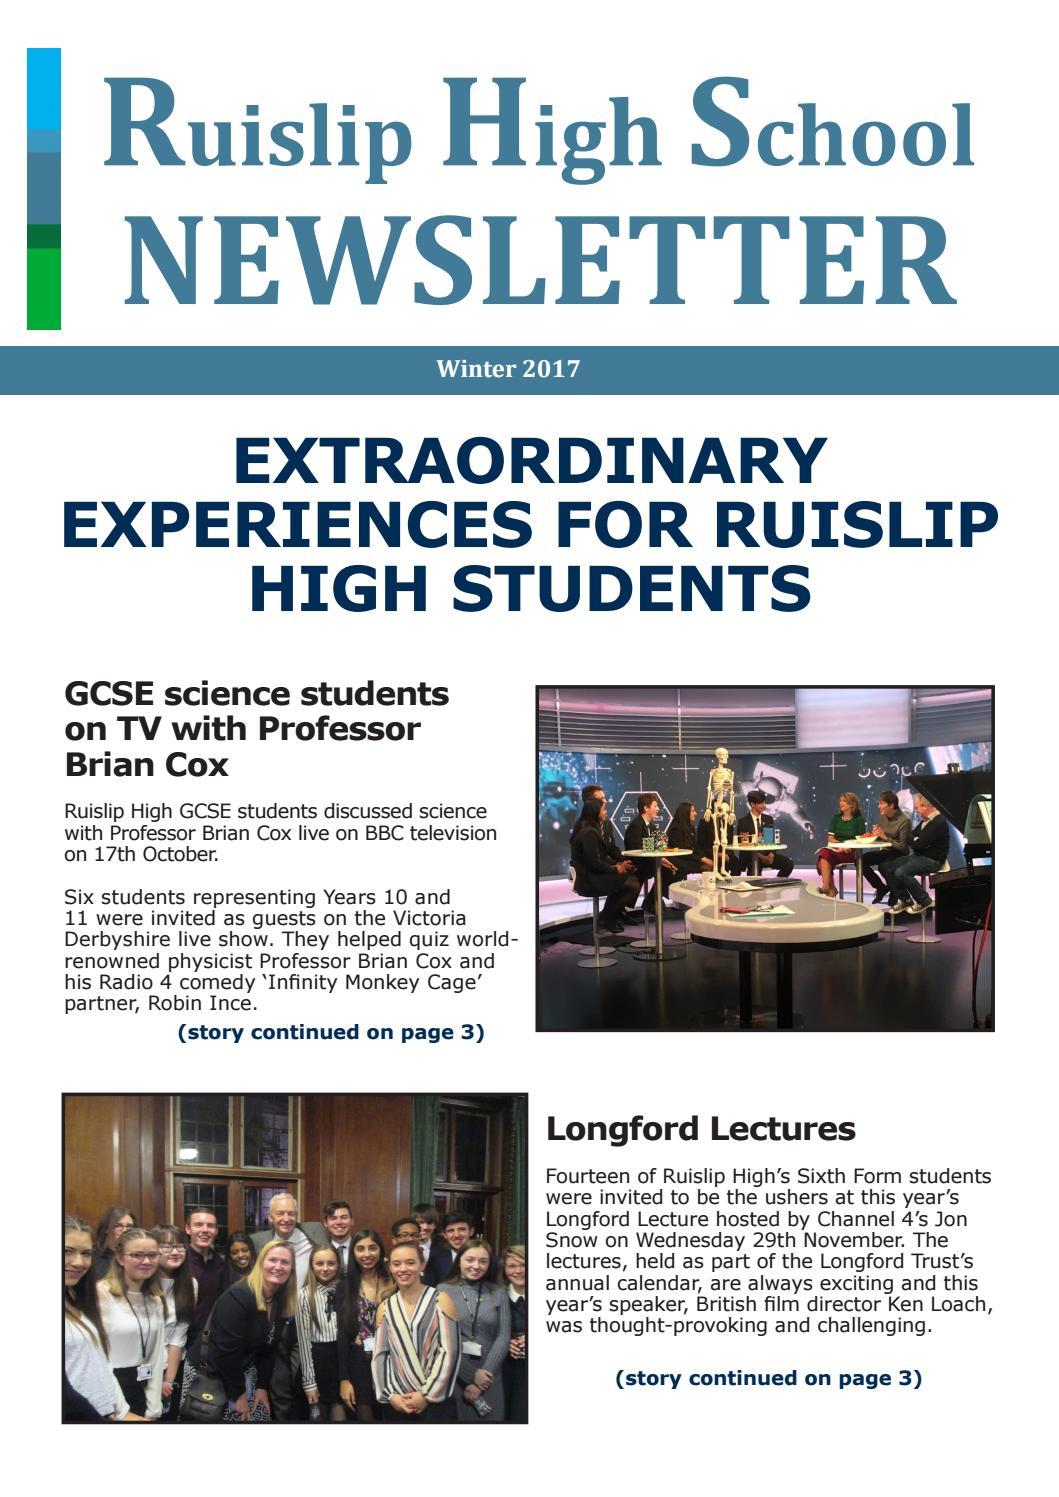 Ruislip High School Winter Newsletter 2017 By Ruislip High School